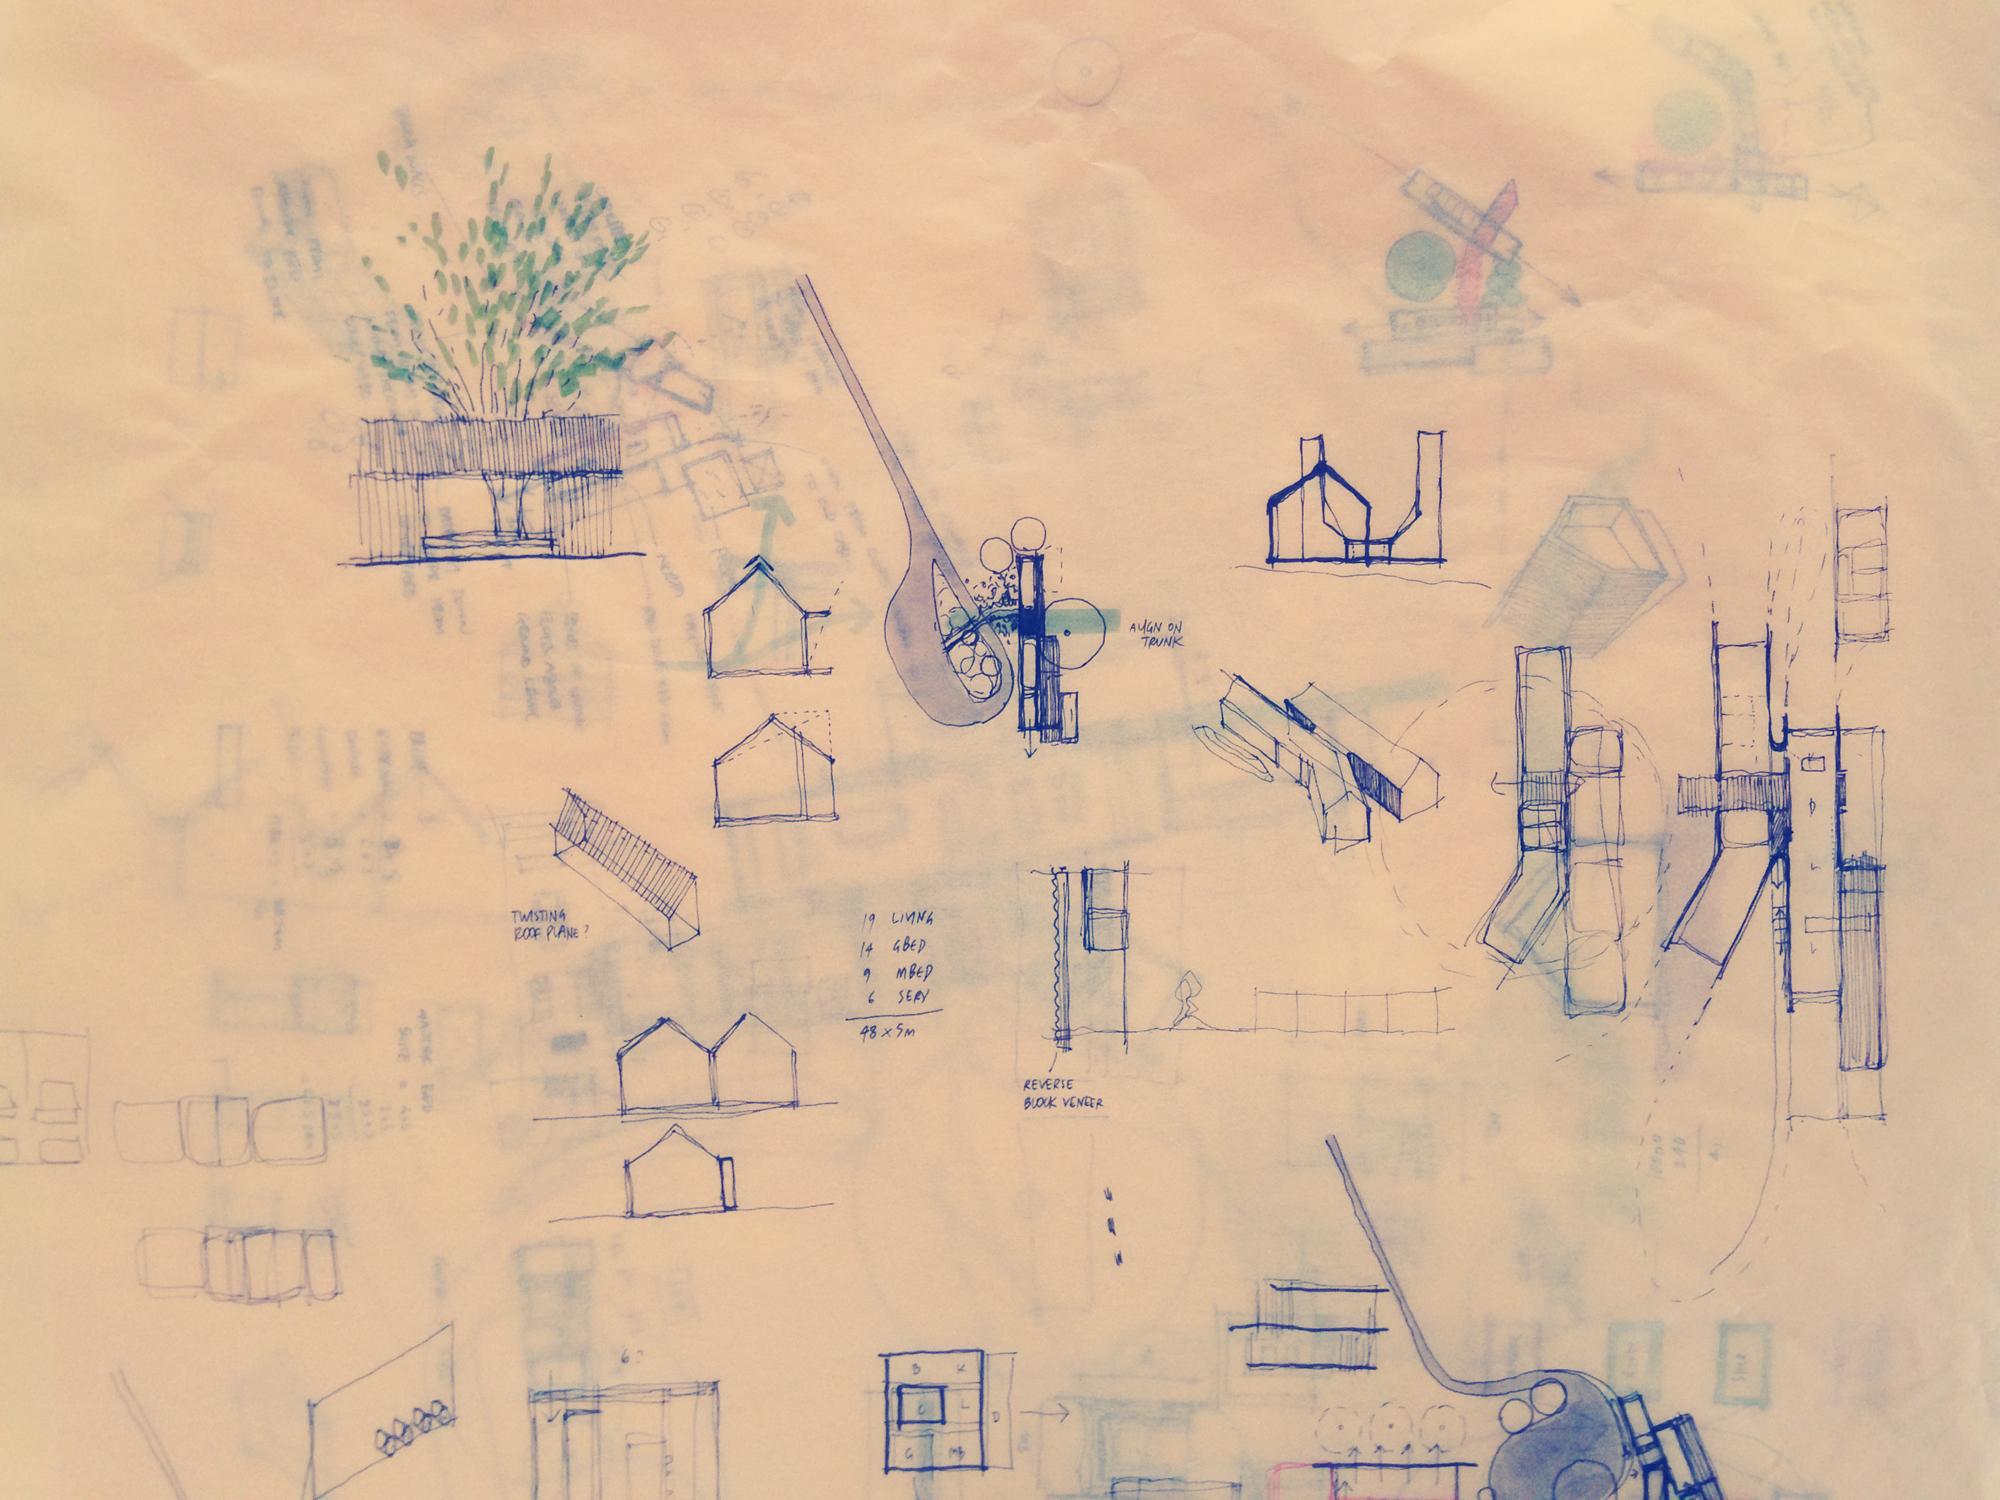 Murrindindi; Sketch; Yellow trace; Drawing; Diagram